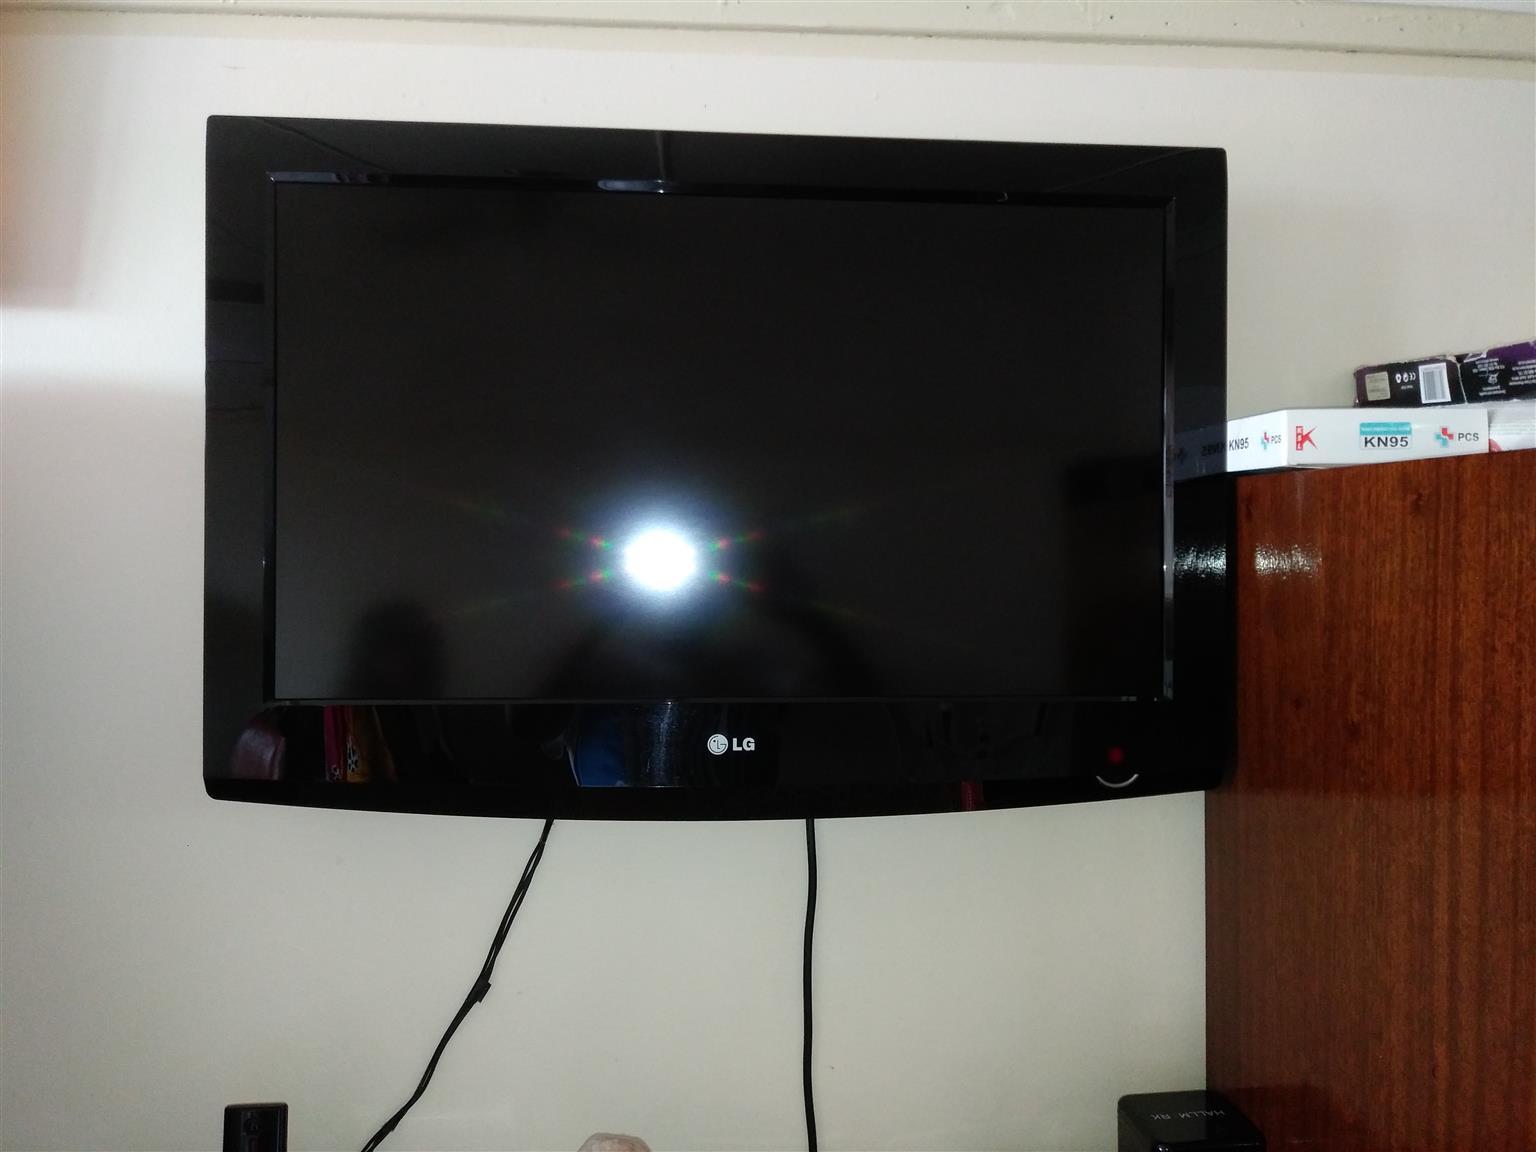 LG Flat Screen TV 32 Inch